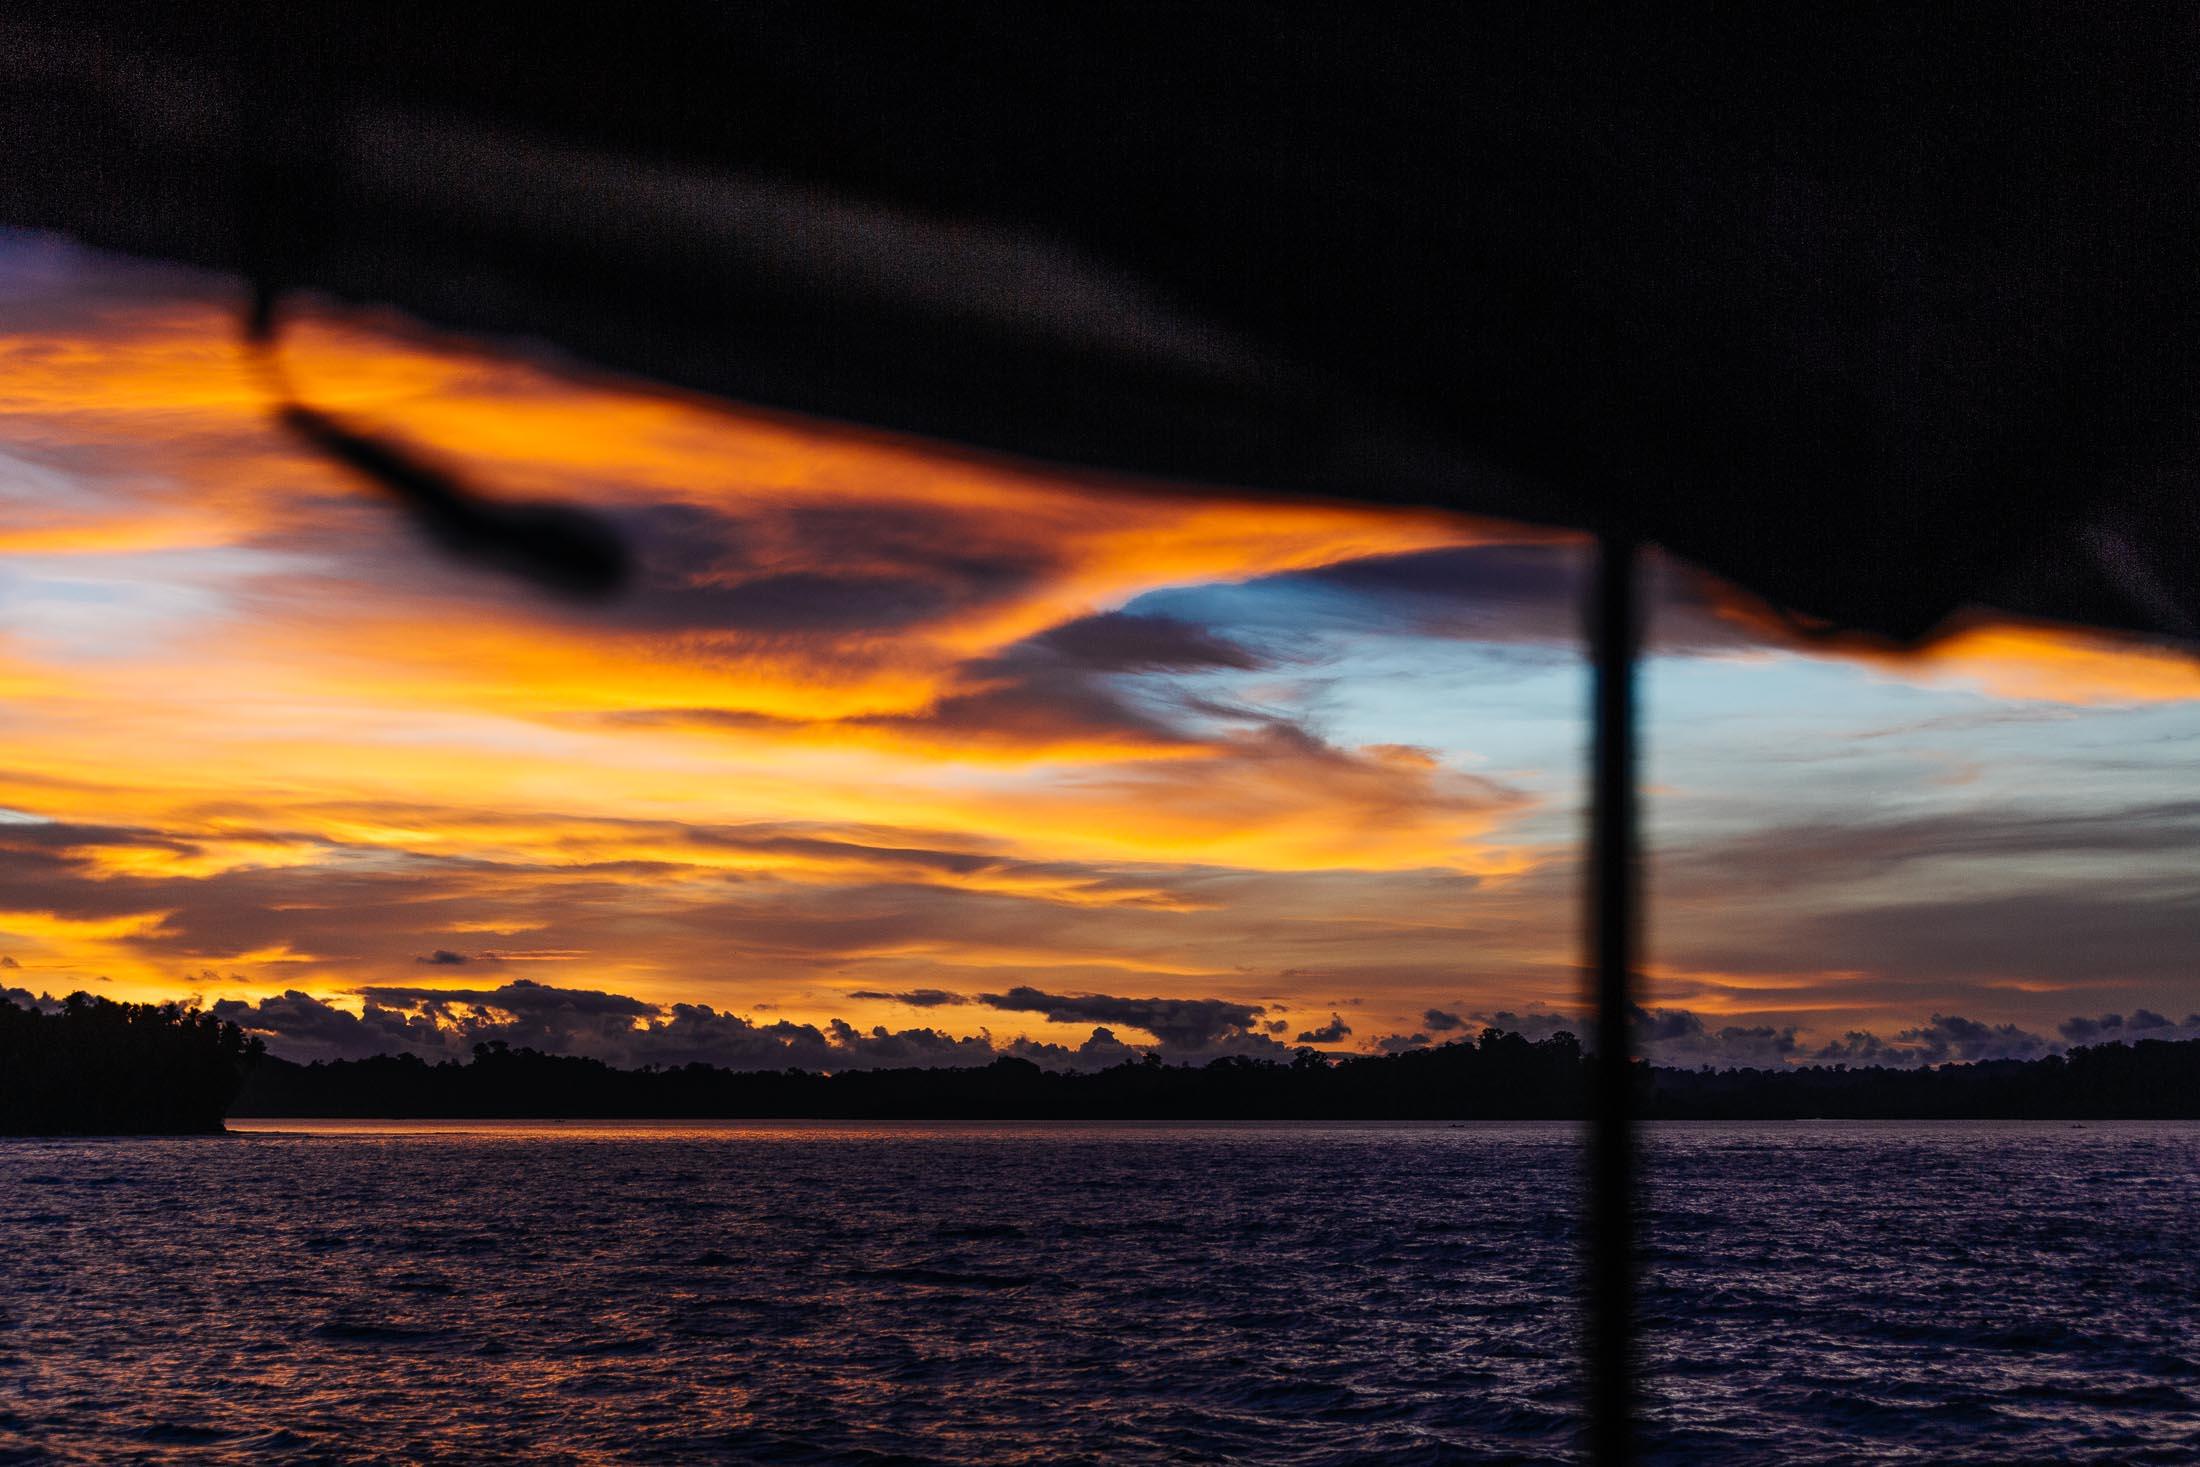 TELO ISLANDS 3